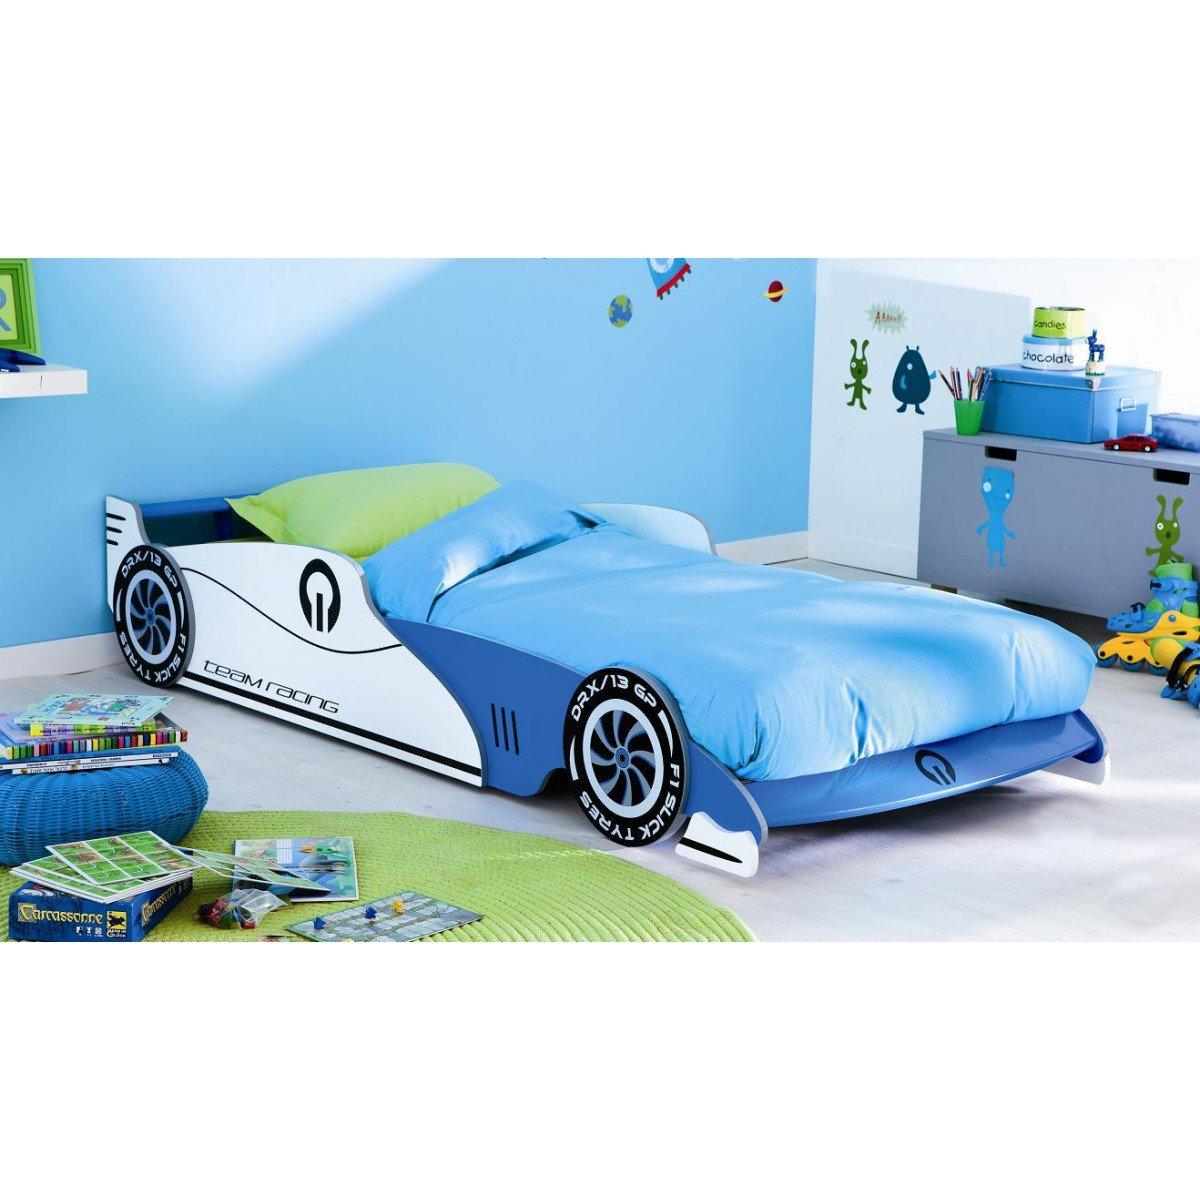 Demeyere 203893 Grand Prix Lit Voiture Extensible MDF Bleu 101 -5 x 209 x 40 -5 cm